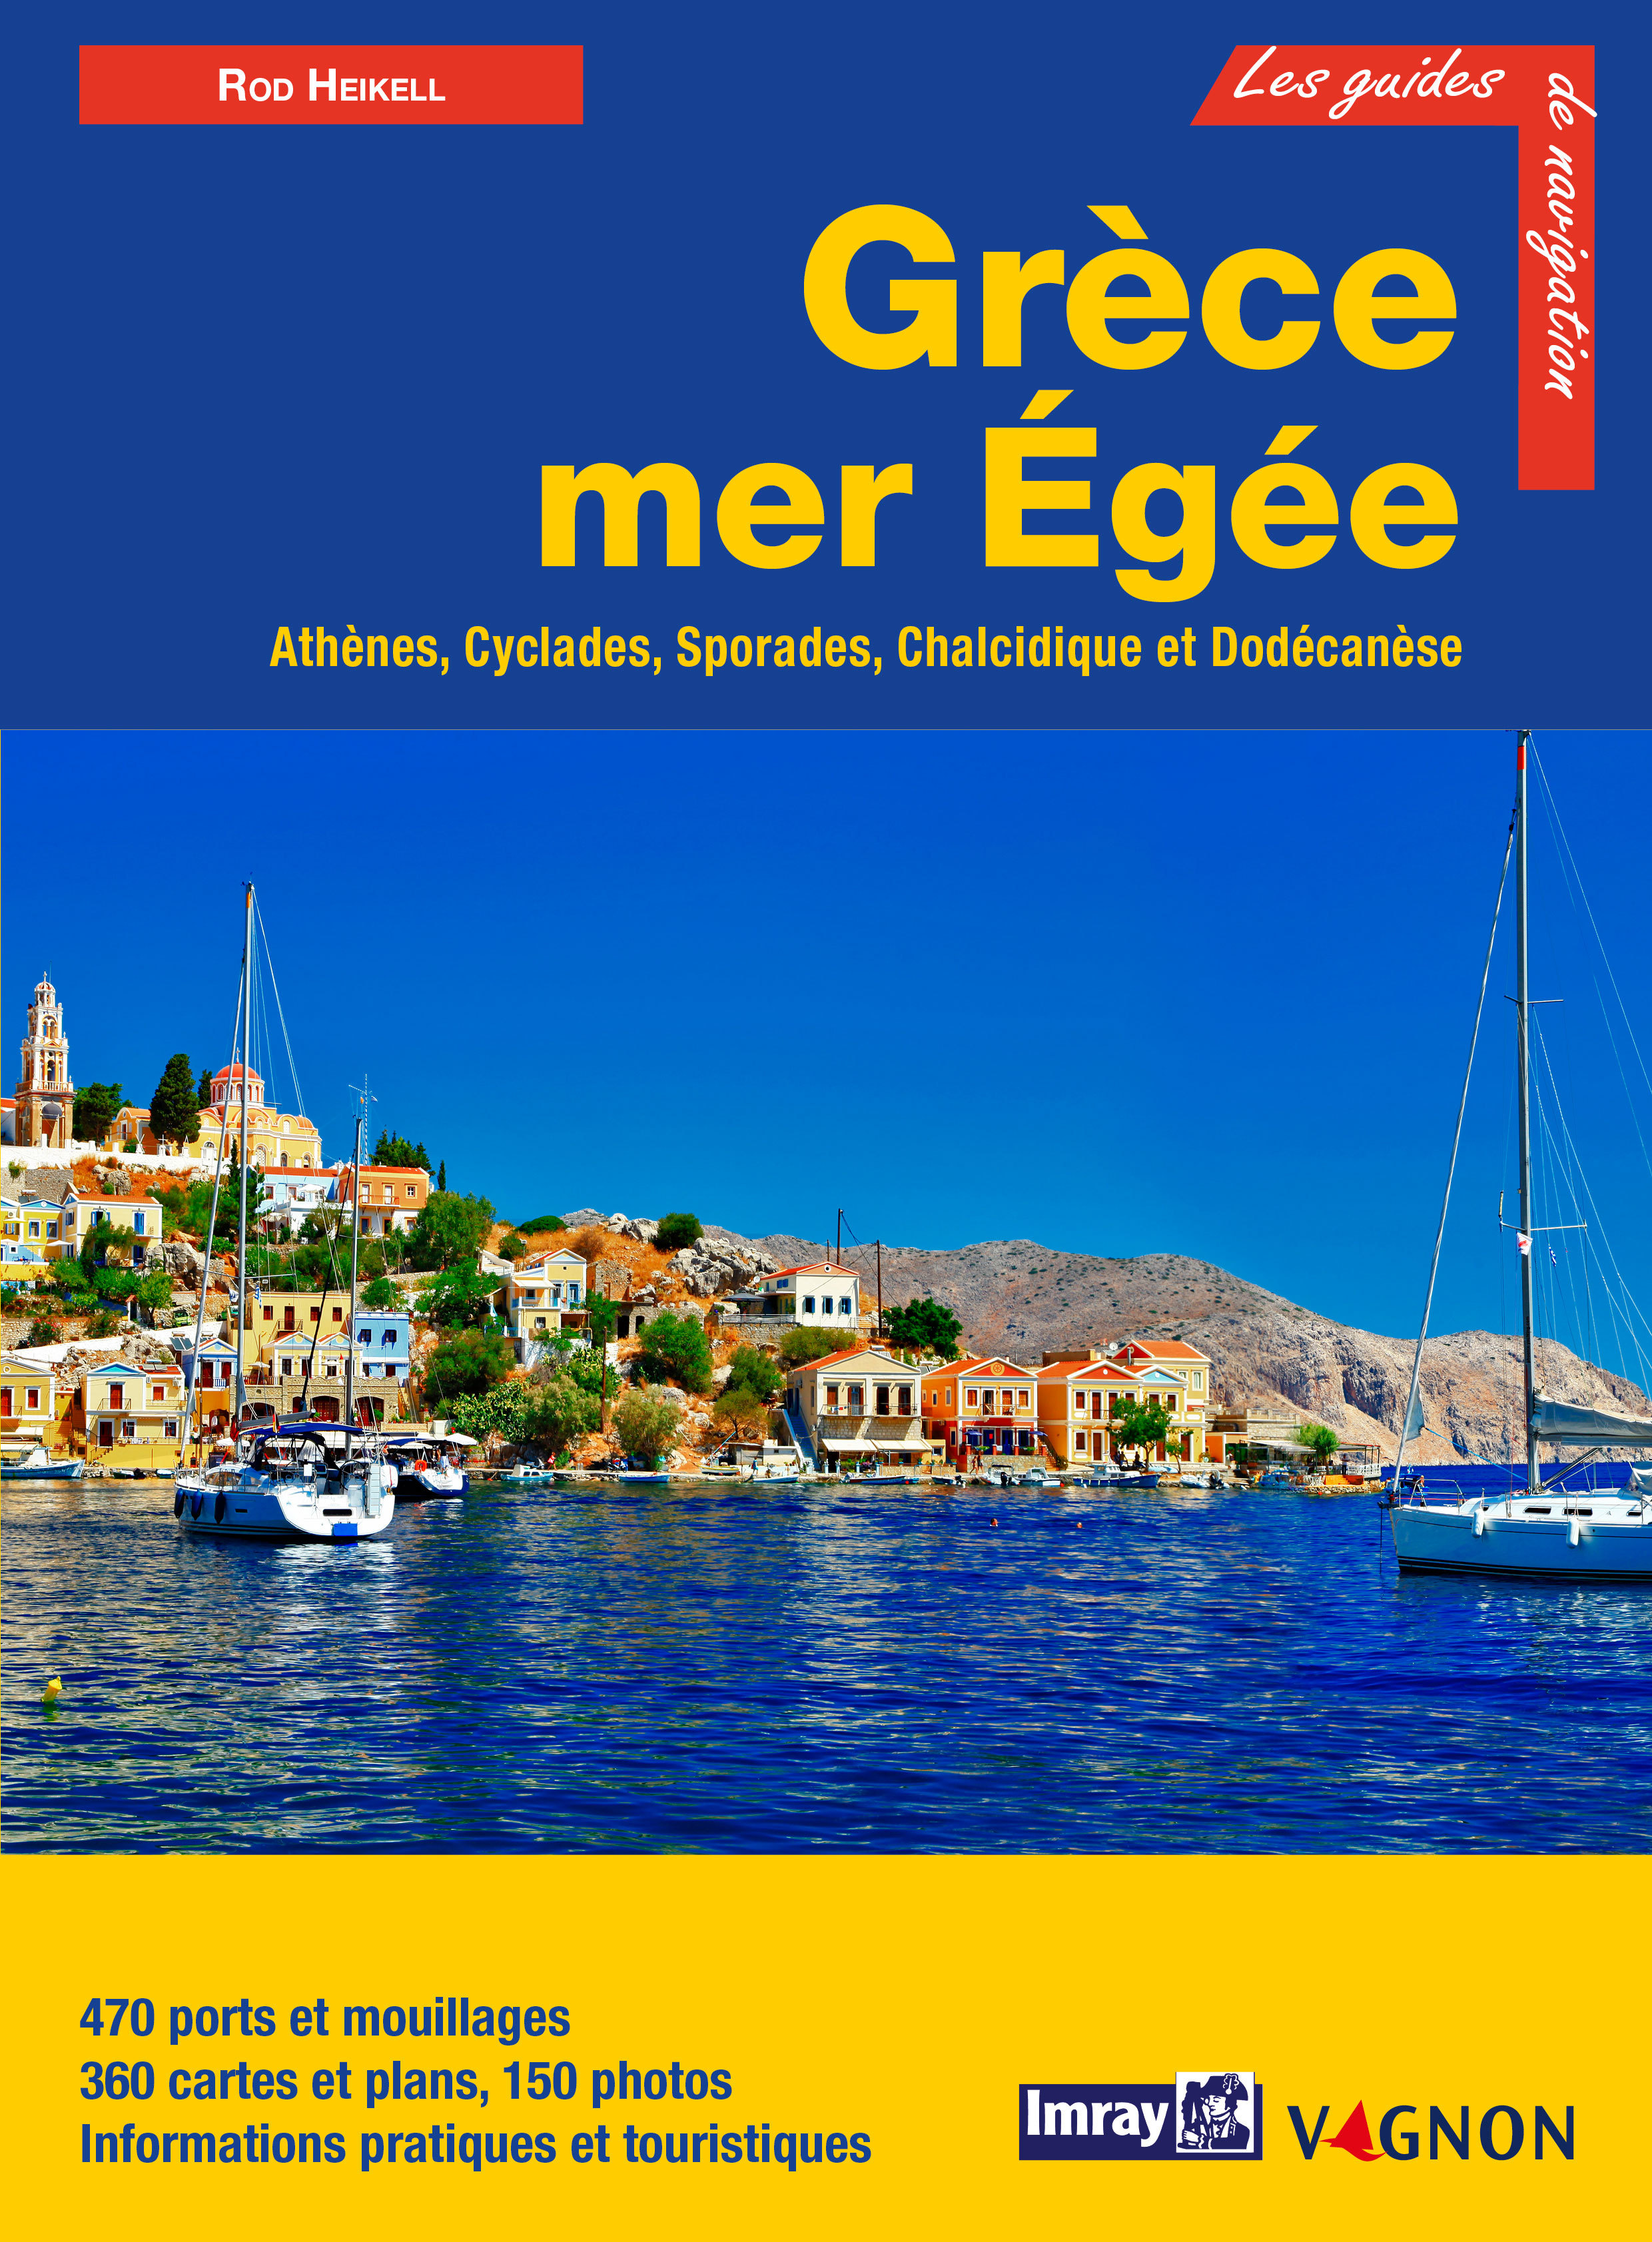 IMRAY GRECE MER EGEE